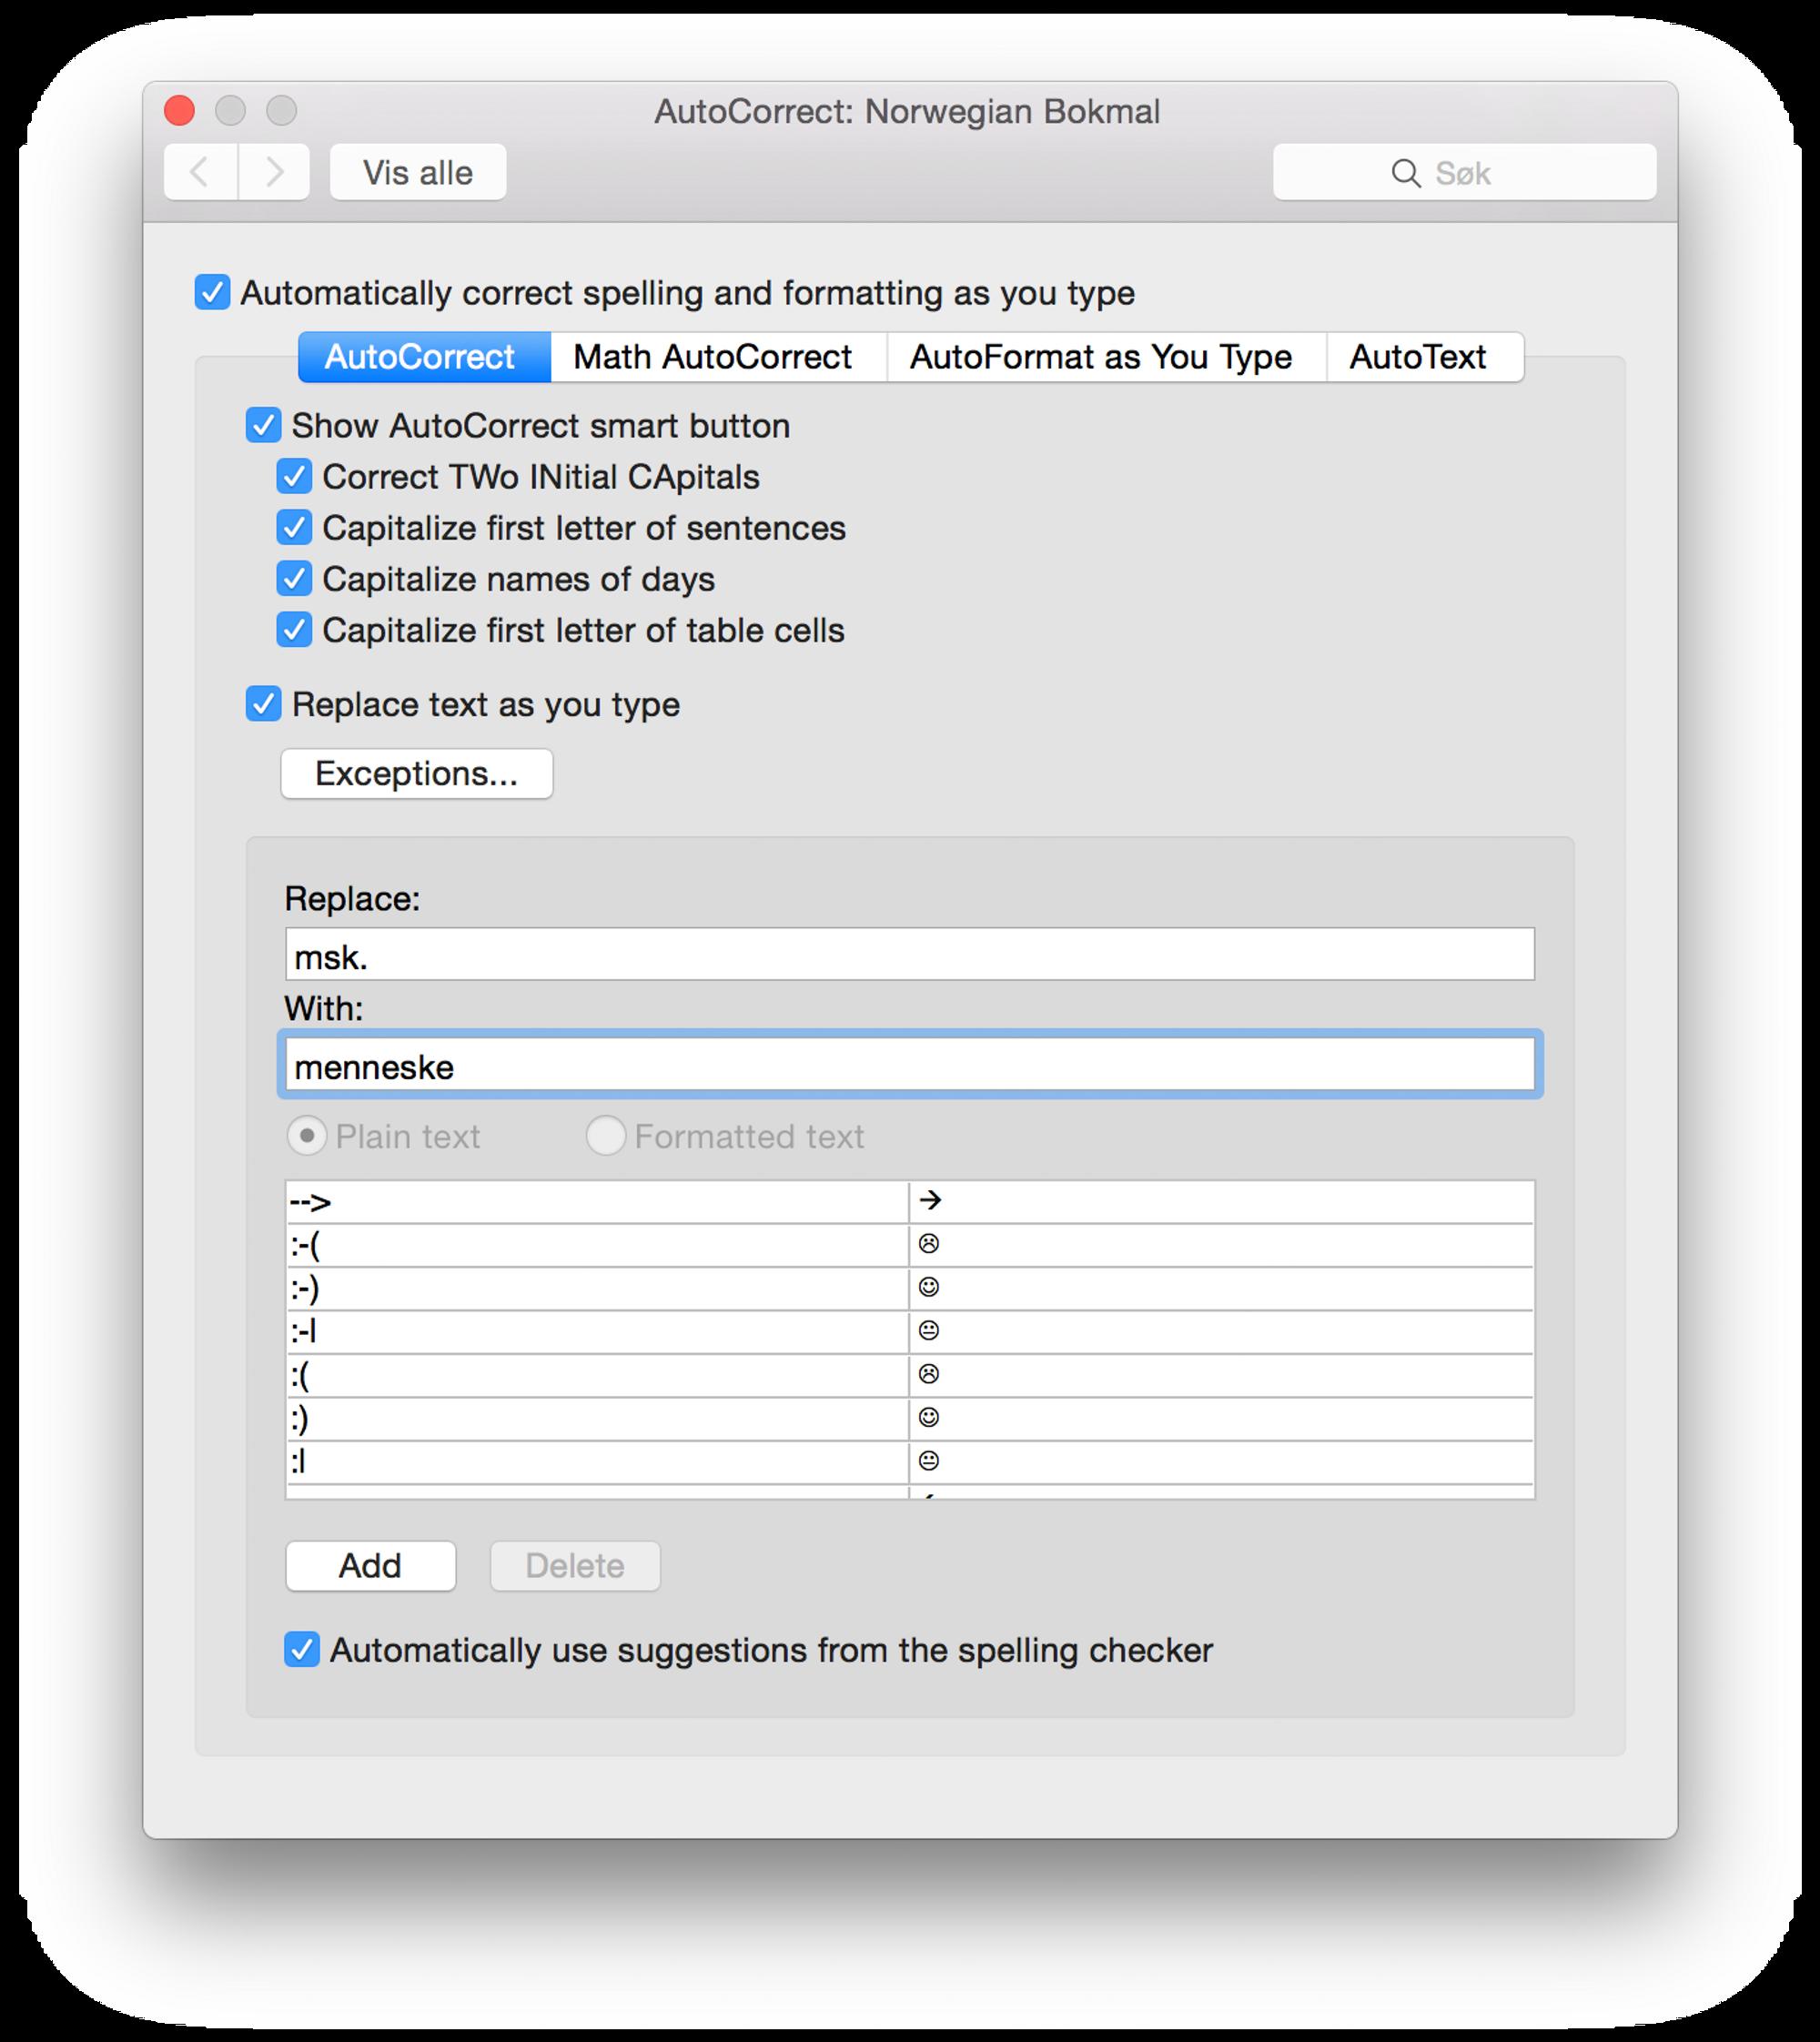 Roblox Error Code 279 On Mac Roblox Generator Free - How To Fix Error Code 279 Roblox On Ipad How To Get Robux